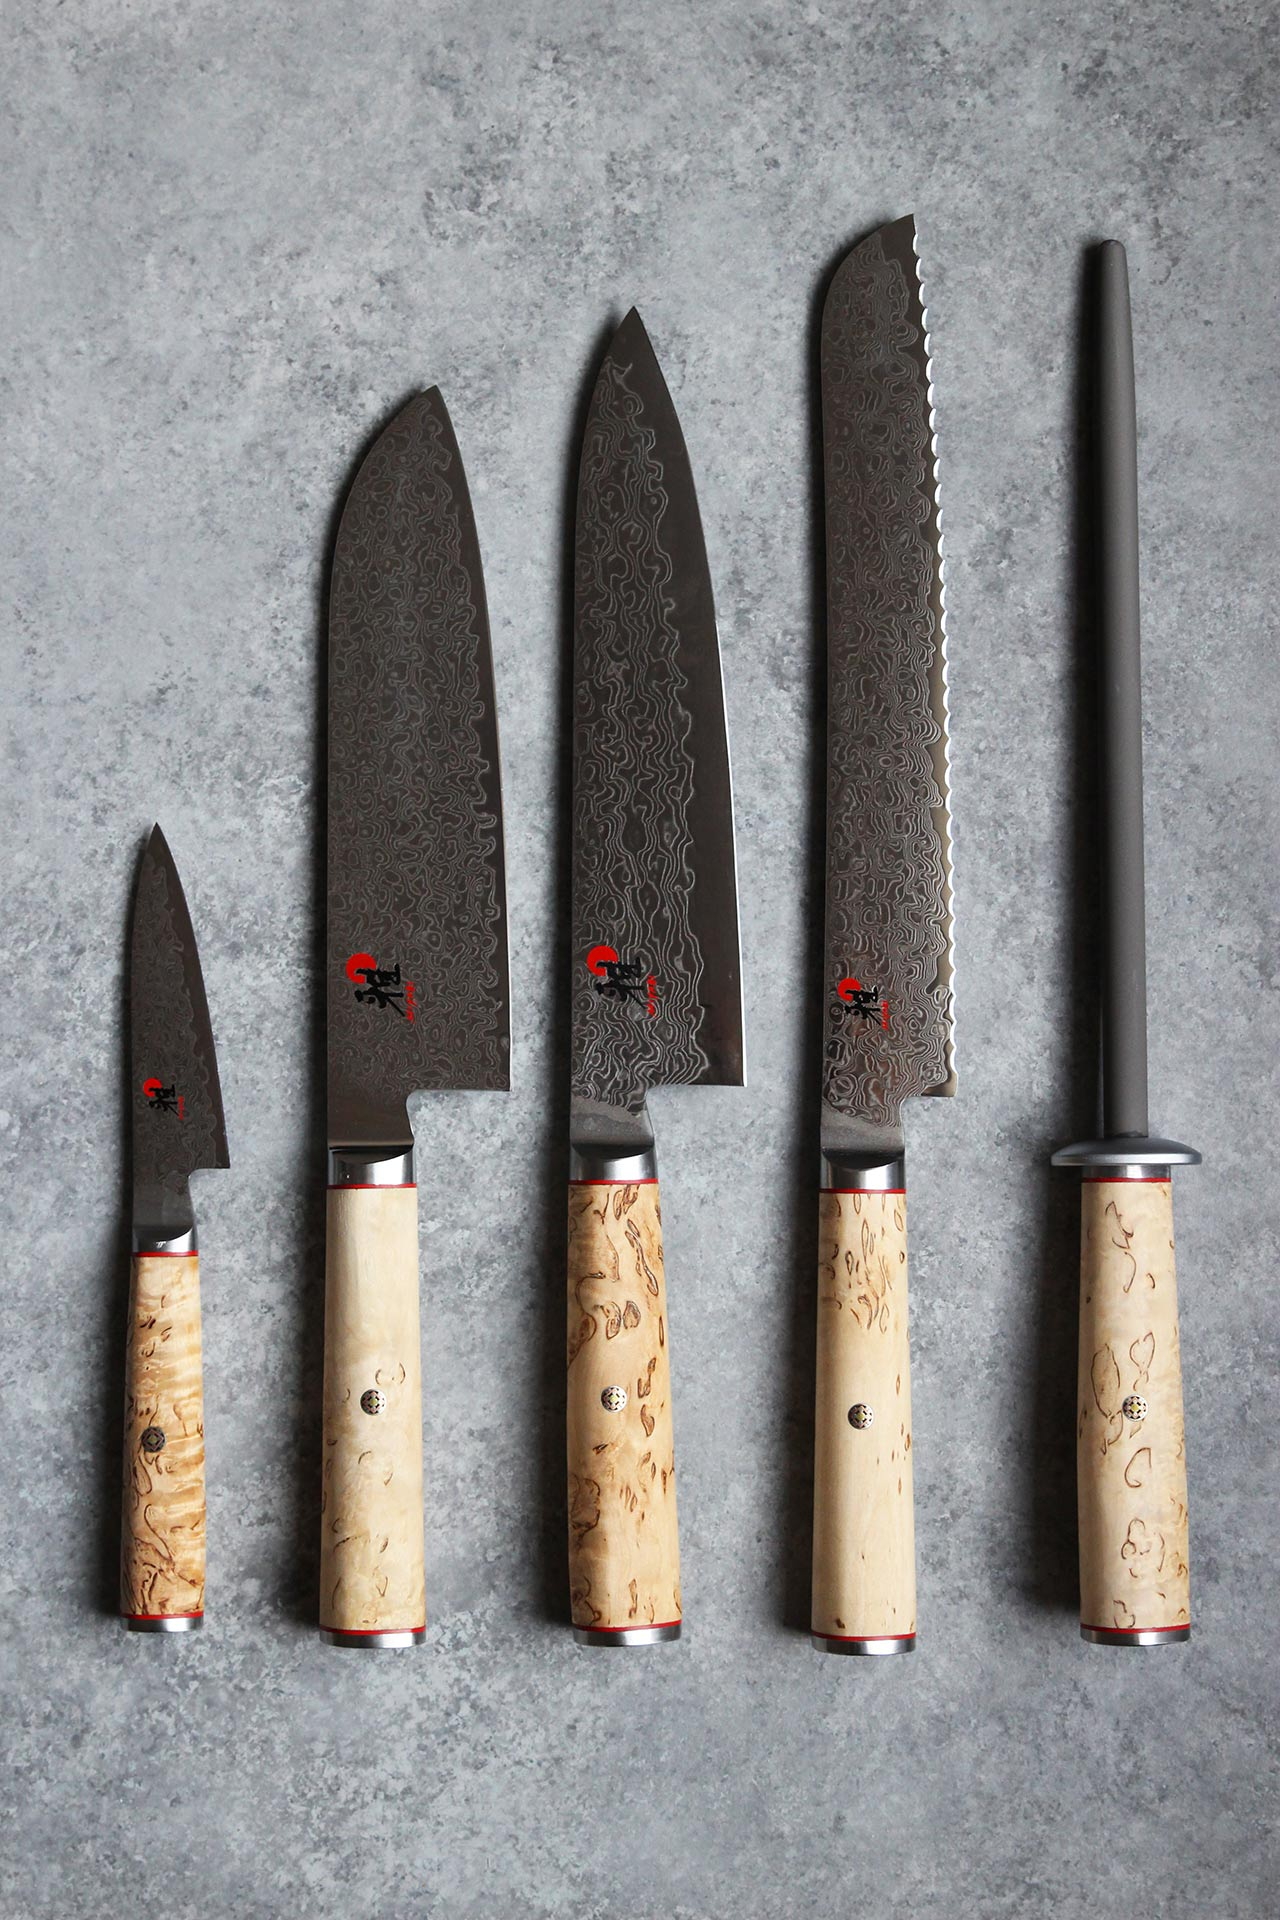 Day 3 miyabi knives honestlyyum for Miyabi knives